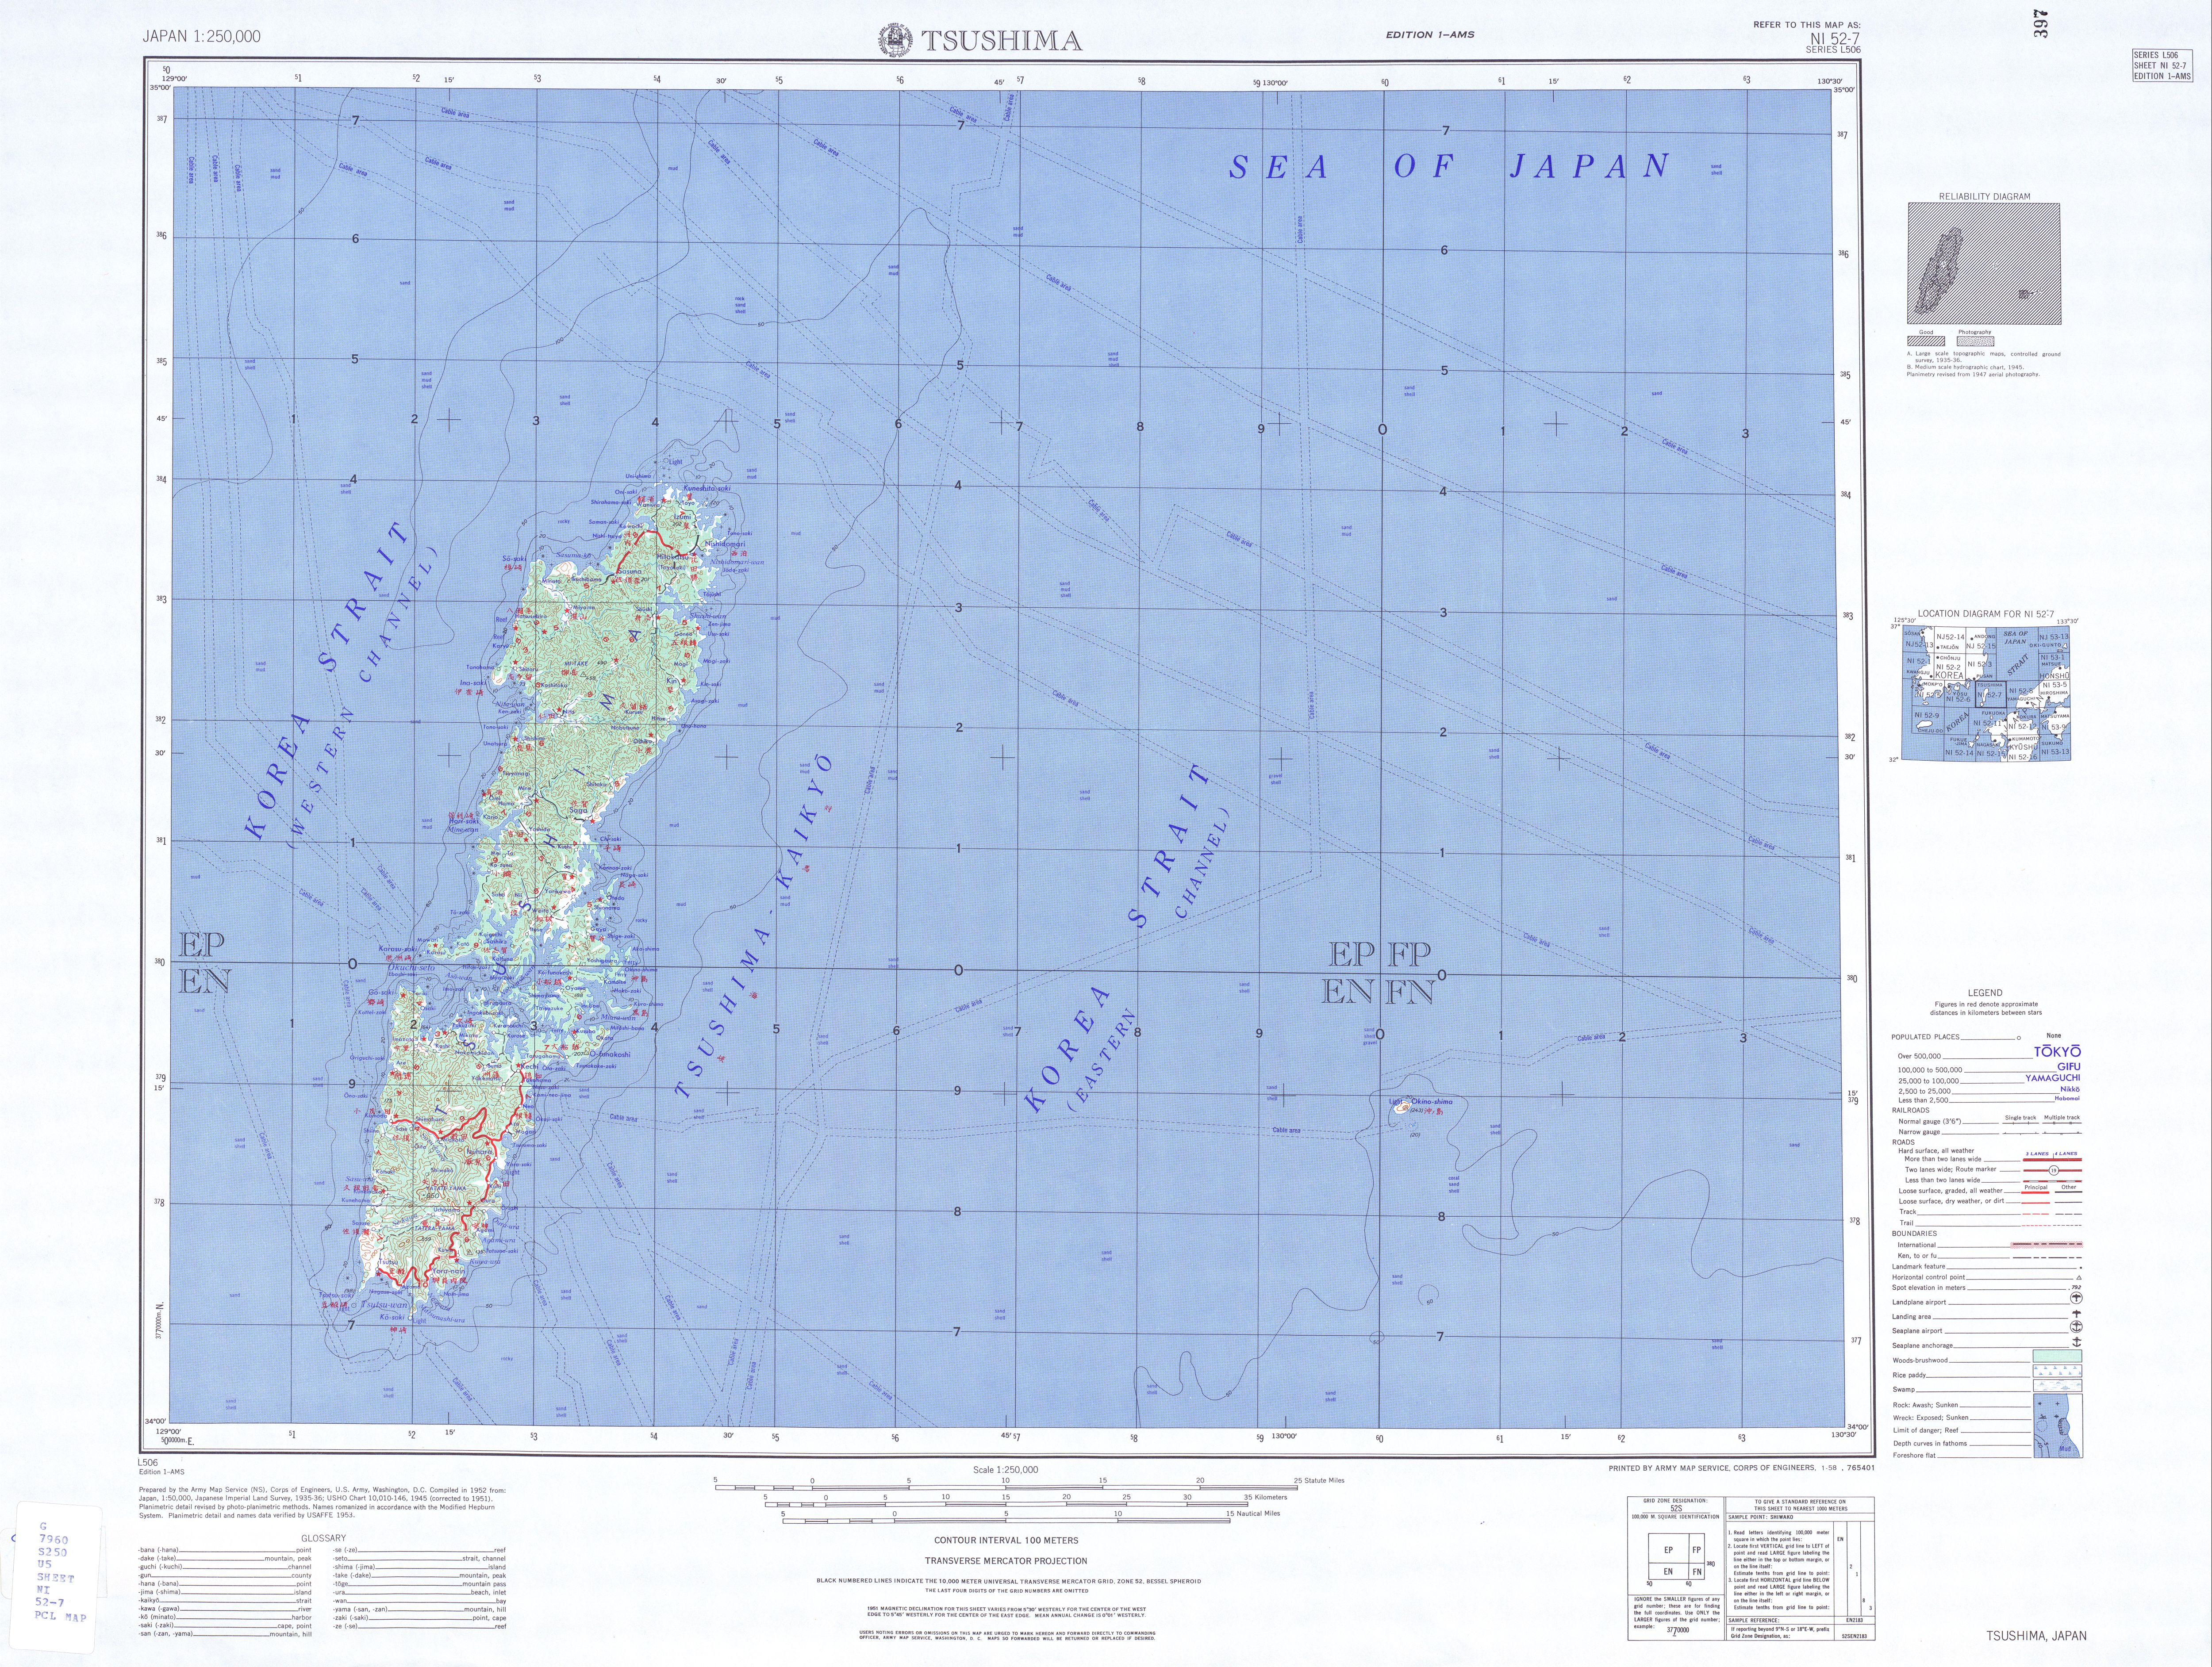 Hoja Tsushima del Mapa Topográfico de Japón 1954